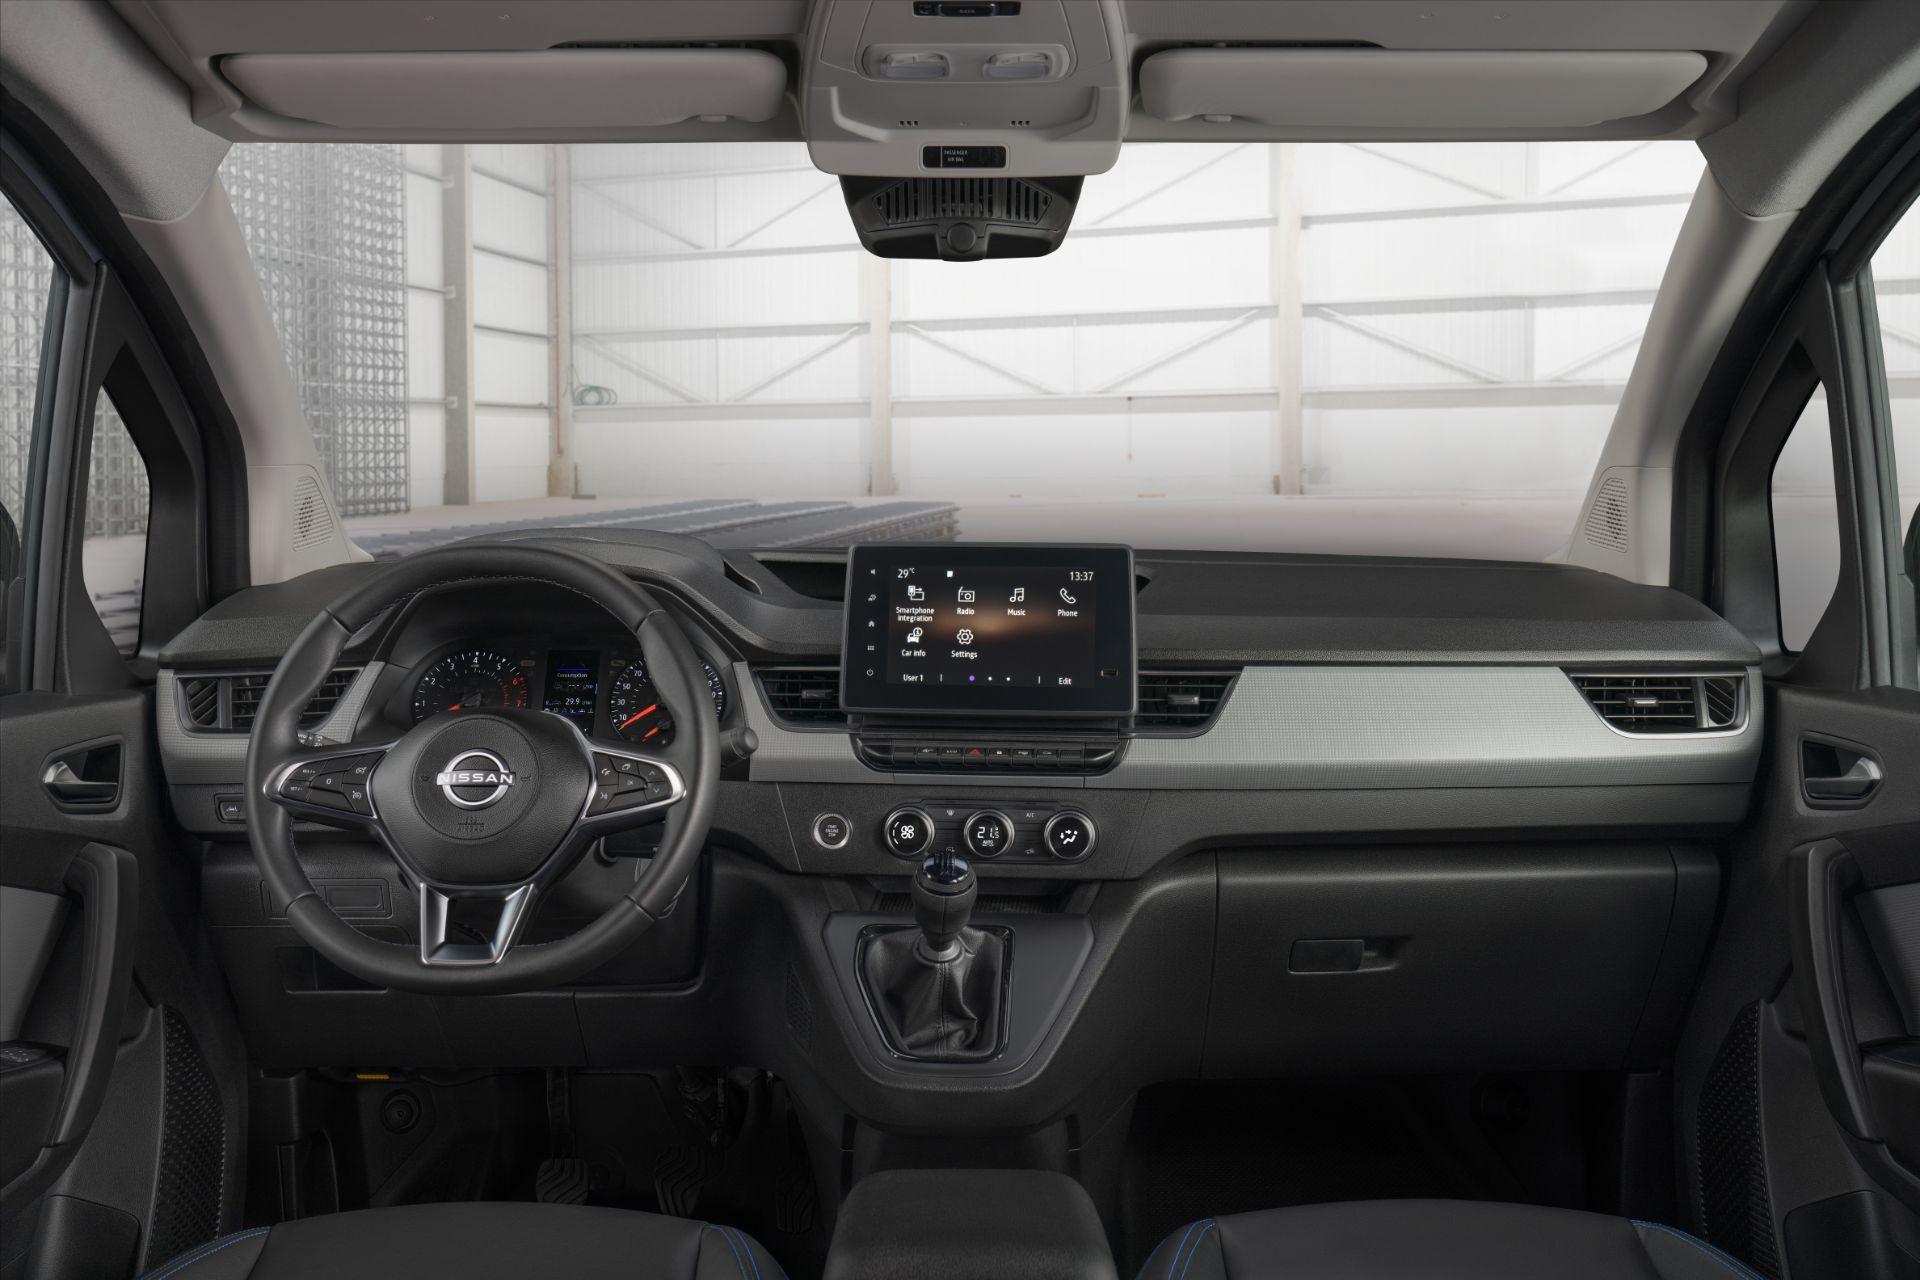 2022-Nissan-Townstar-petrol-van-dynamic-14